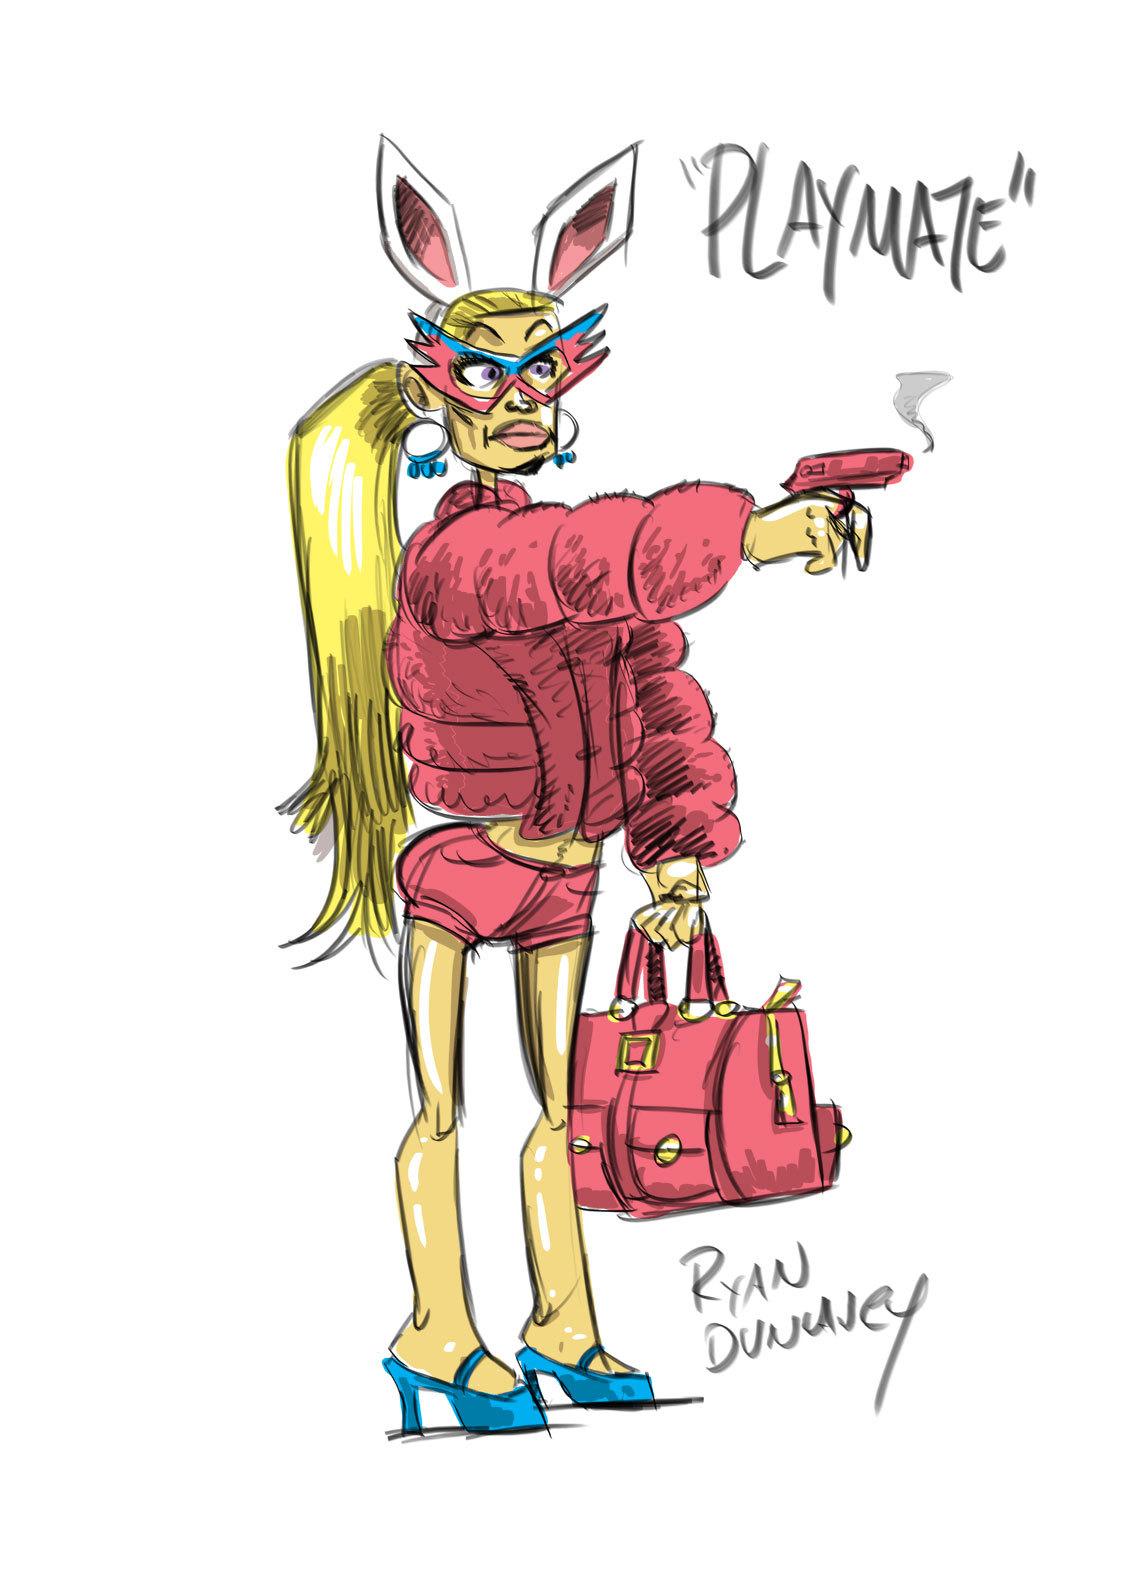 Playmate - Bad Guy villain